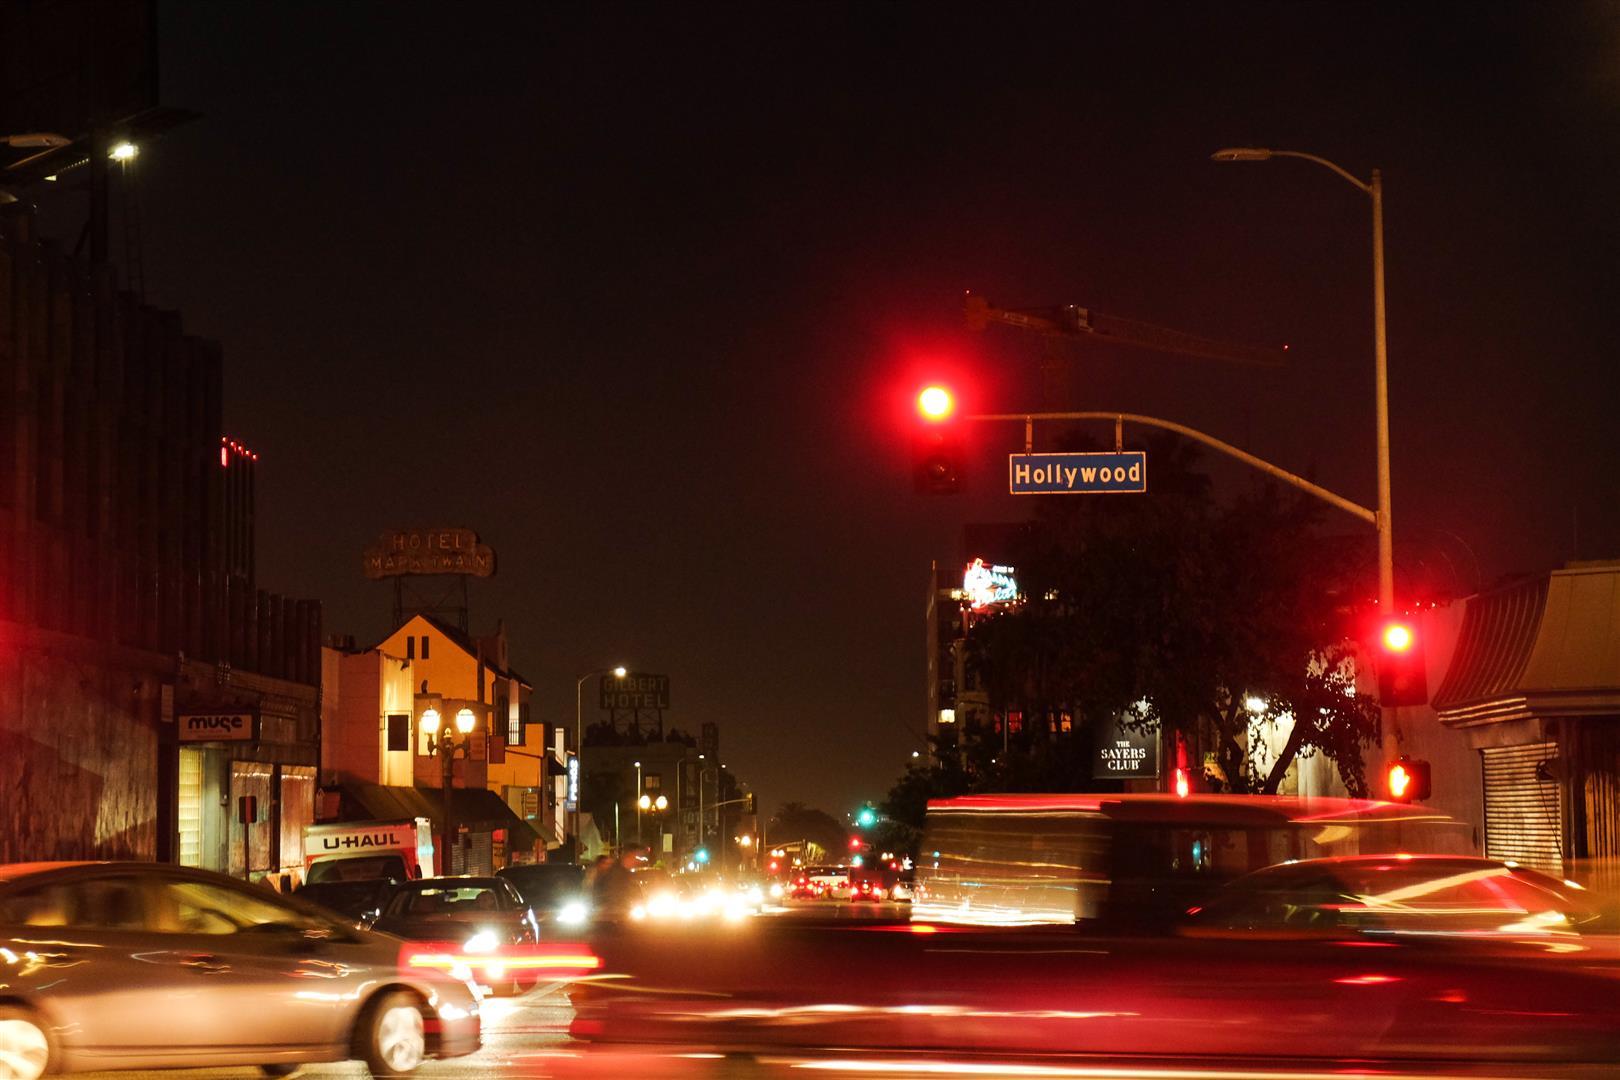 Hollywood Los Angeles (1)